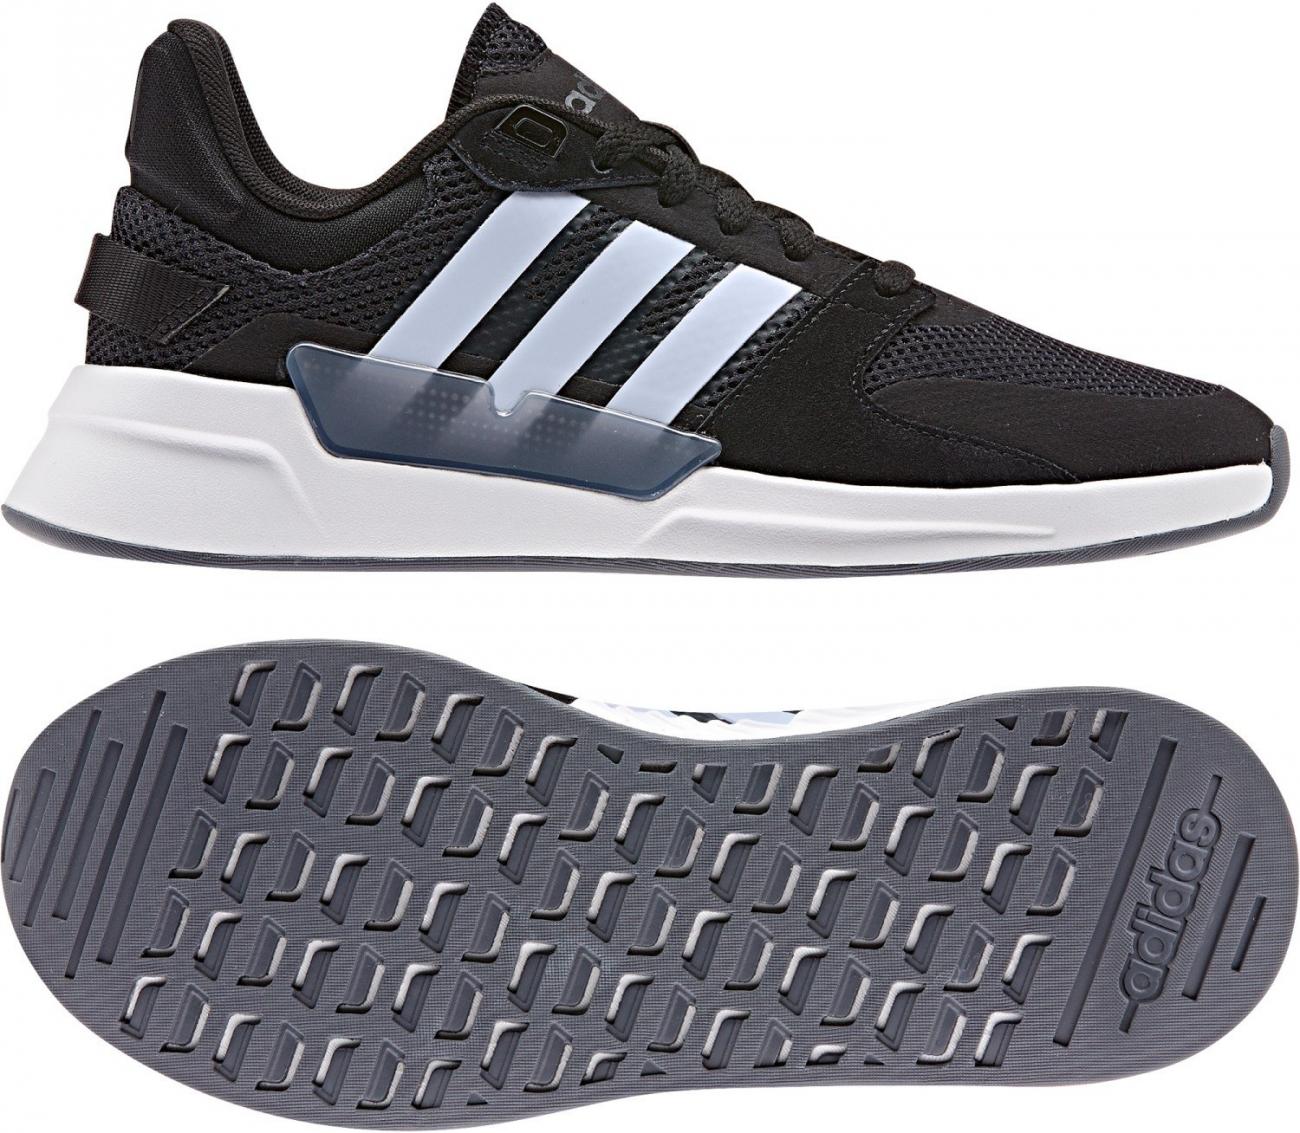 Adidas Damen Sneaker Run90s